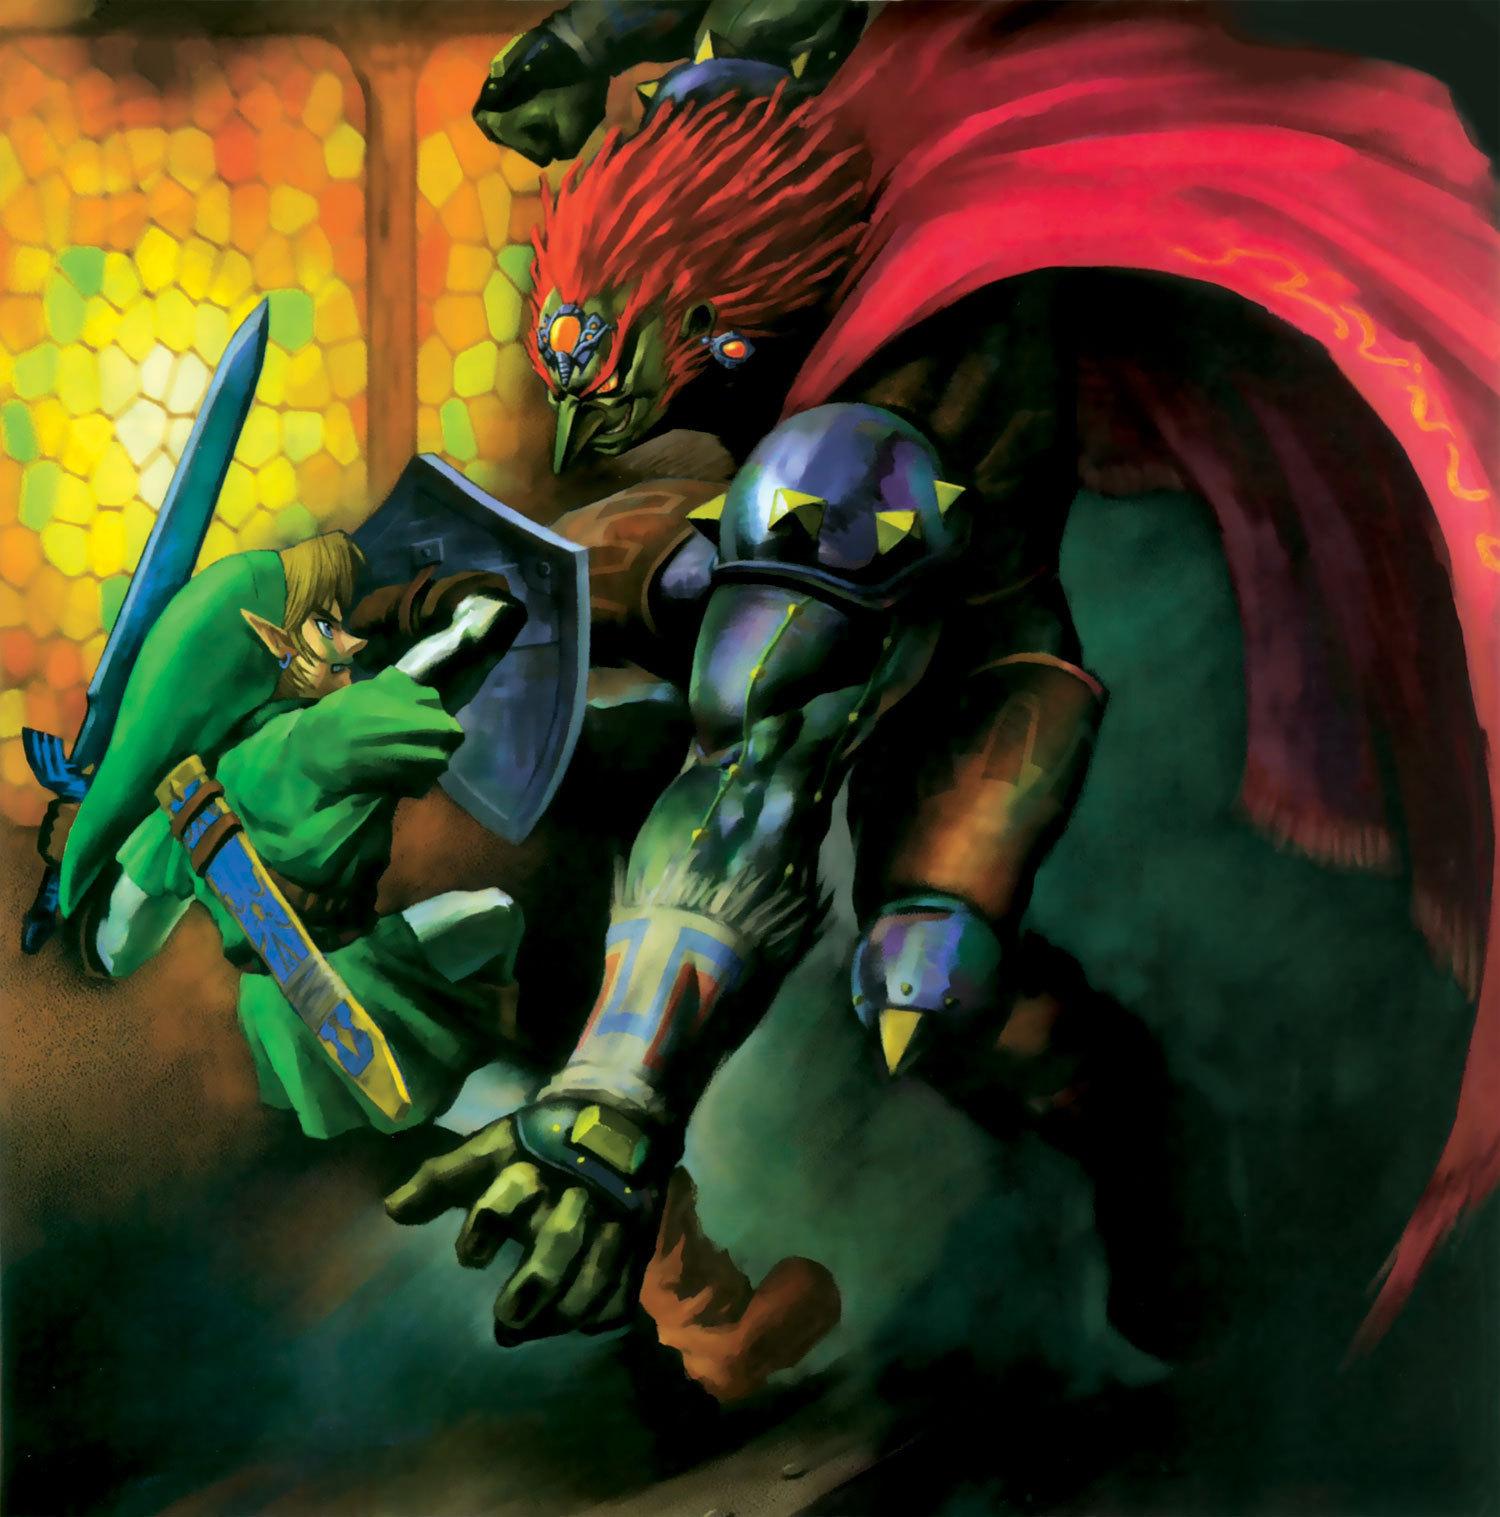 http://2.bp.blogspot.com/-YVNWuvhqQ2o/Tbn0E_cWdUI/AAAAAAAAABY/ZJUohGRAnGE/s1600/The-Legend-of-Zelda-Ocarina-of-Time-the-ocarina-of-time-9080535-1500-1517.jpg